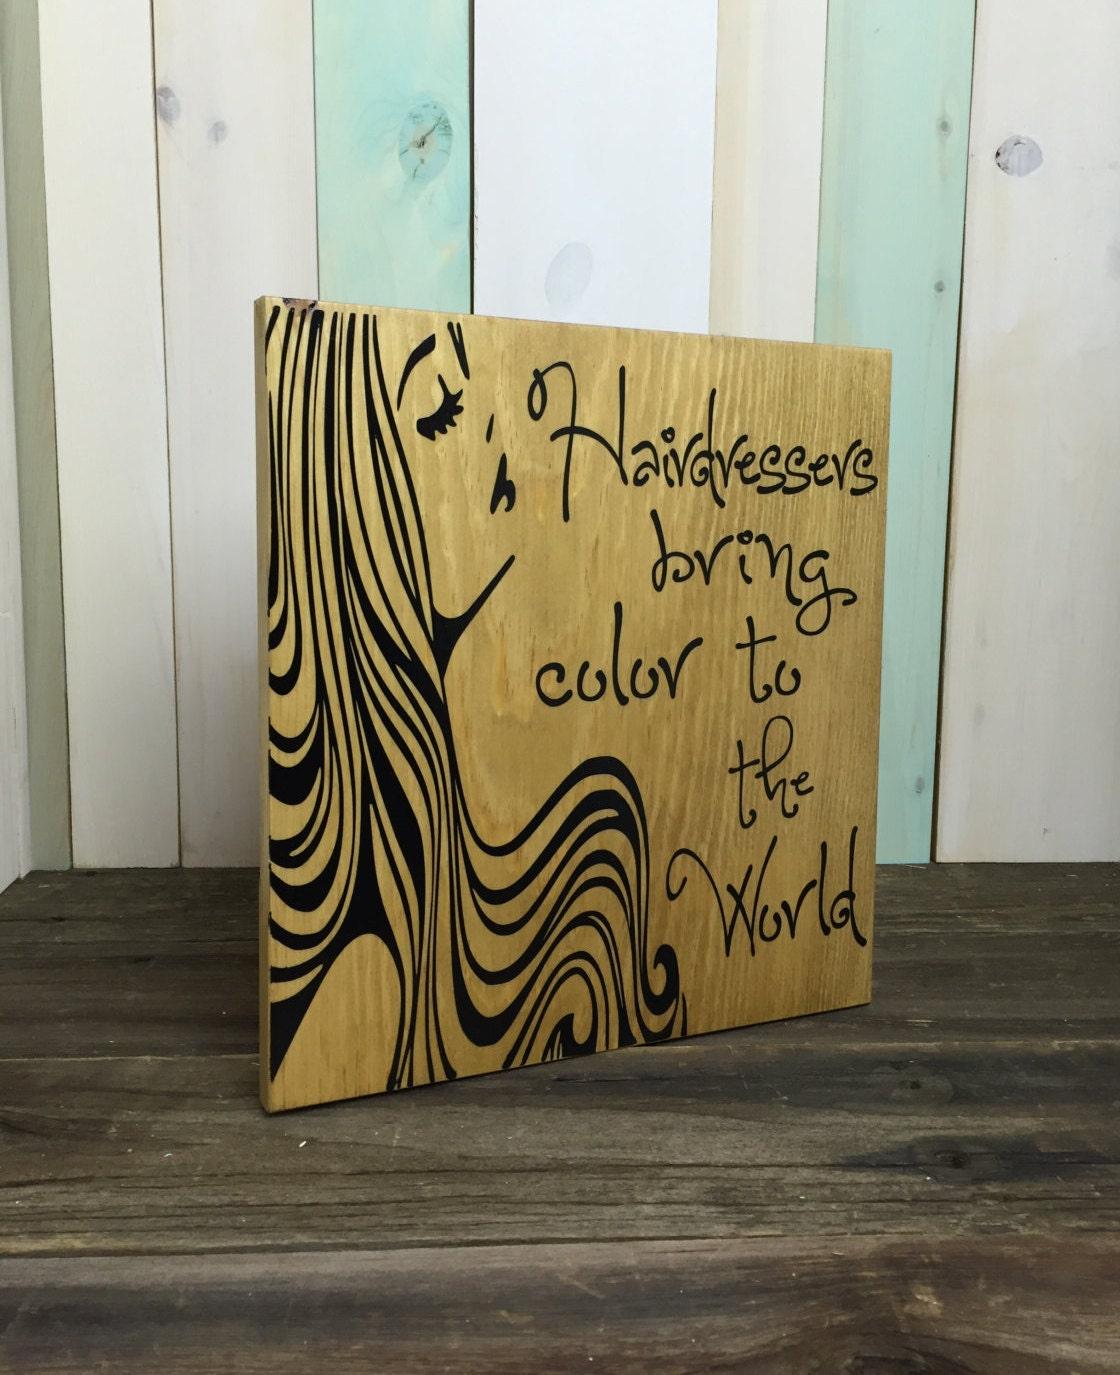 Hair stylist christmas ornaments - Hairdresser Sign Hair Stylist Sign Salon Sign Wood Sign Wooden Sign